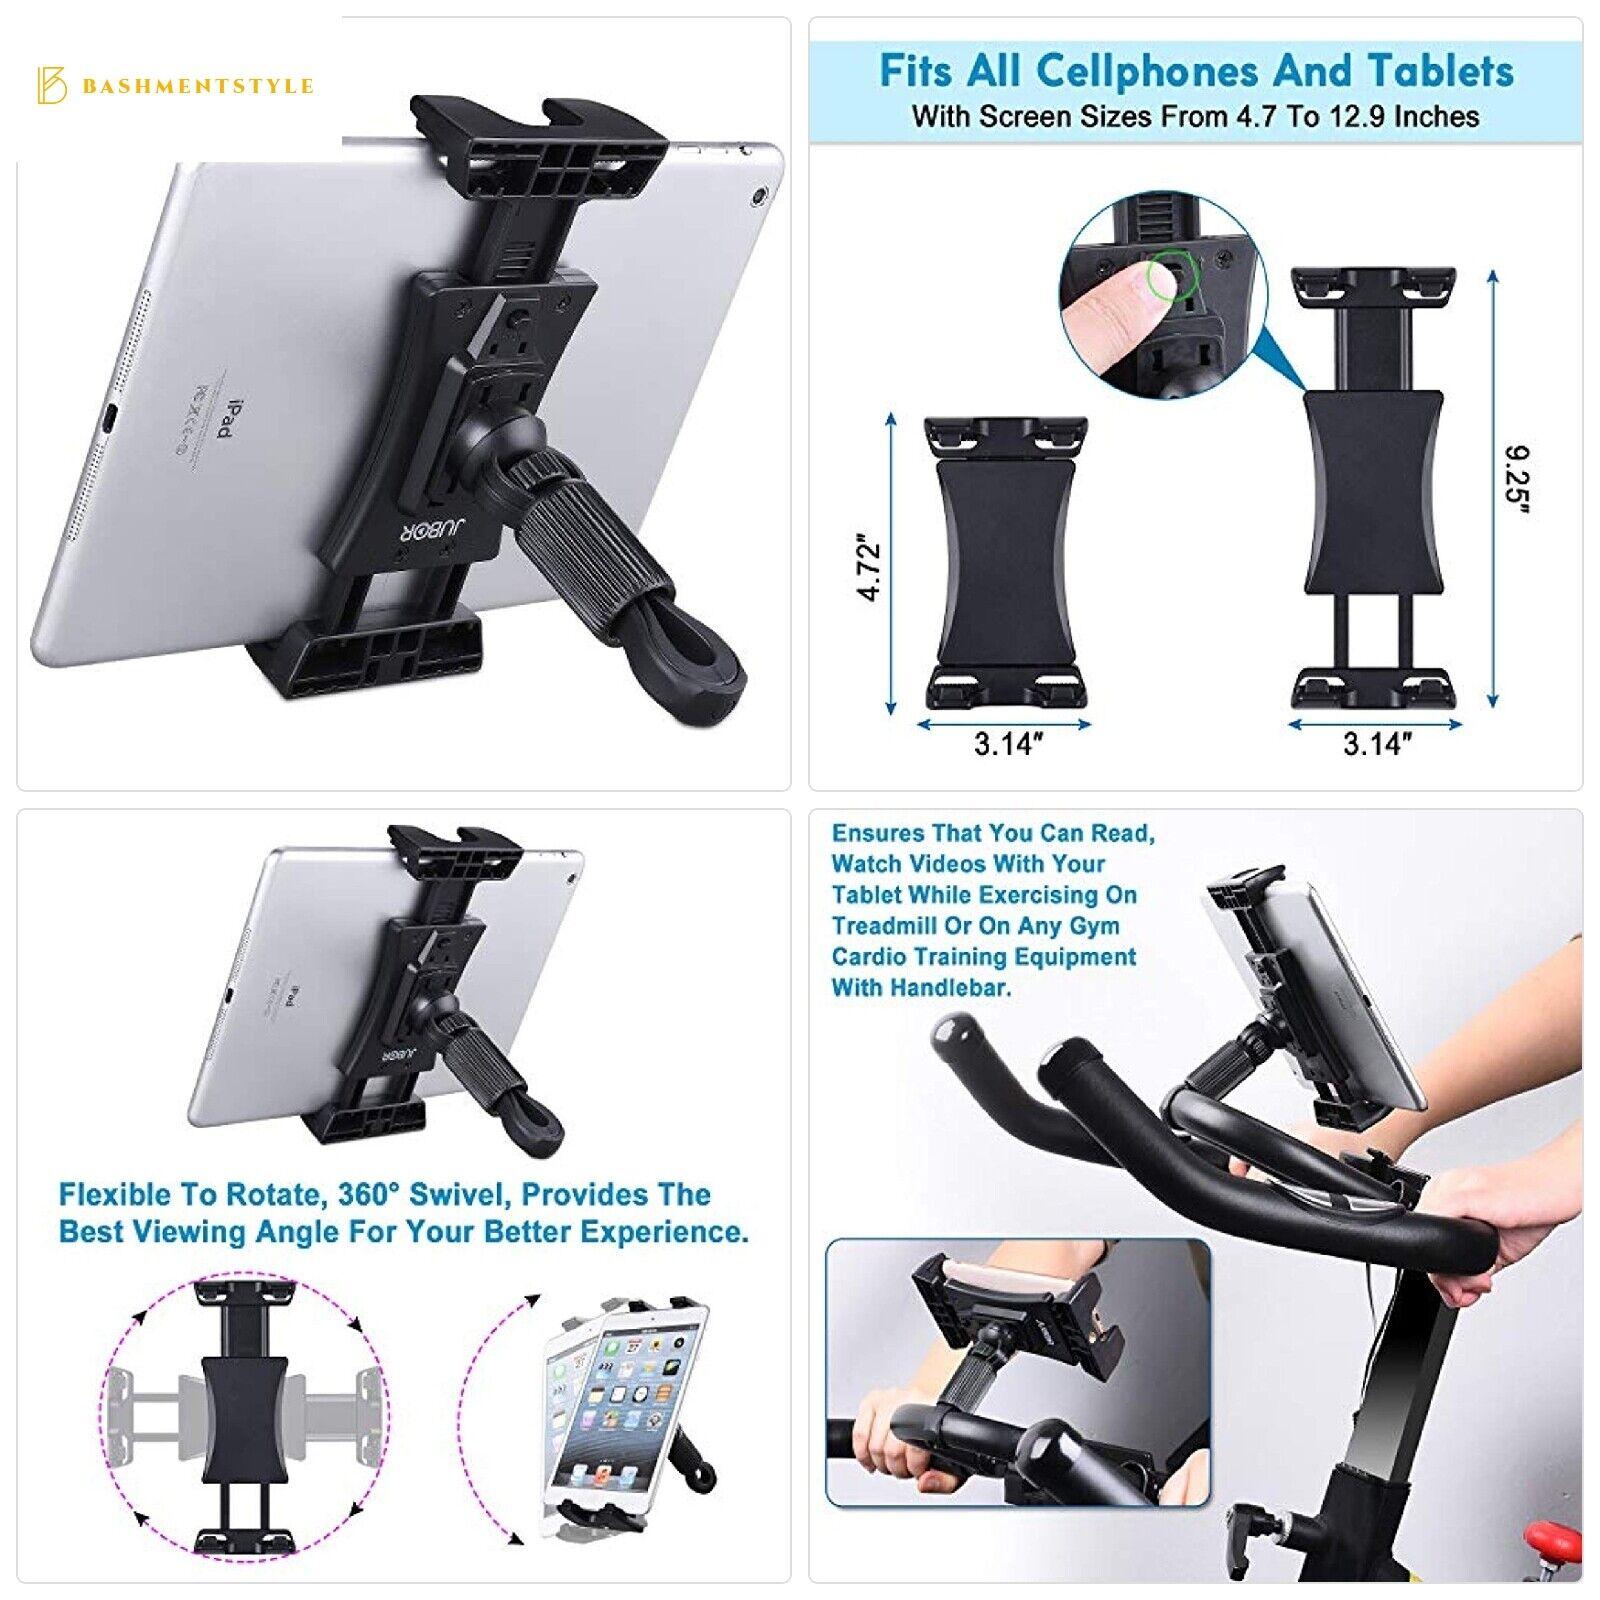 JUBOR Bike Tablet Holder, Portable Bicycle Car Phone Tablet